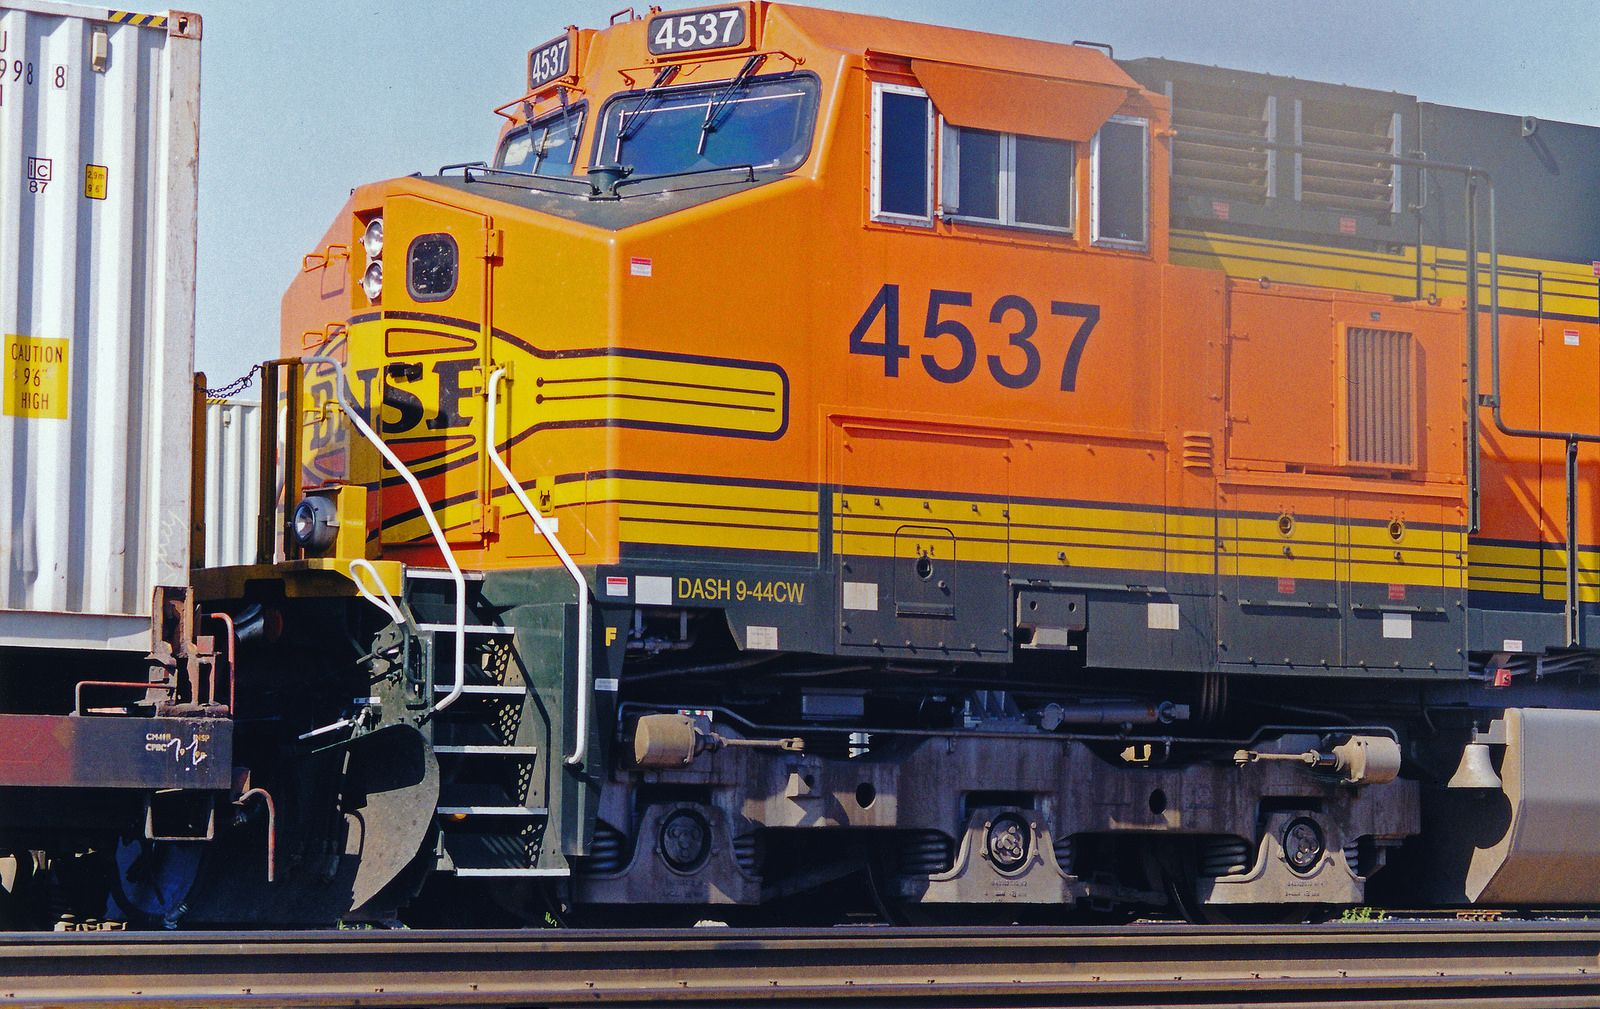 BNSF C44-9W No  4537 At Hobart Yard | Railroads - BNSF